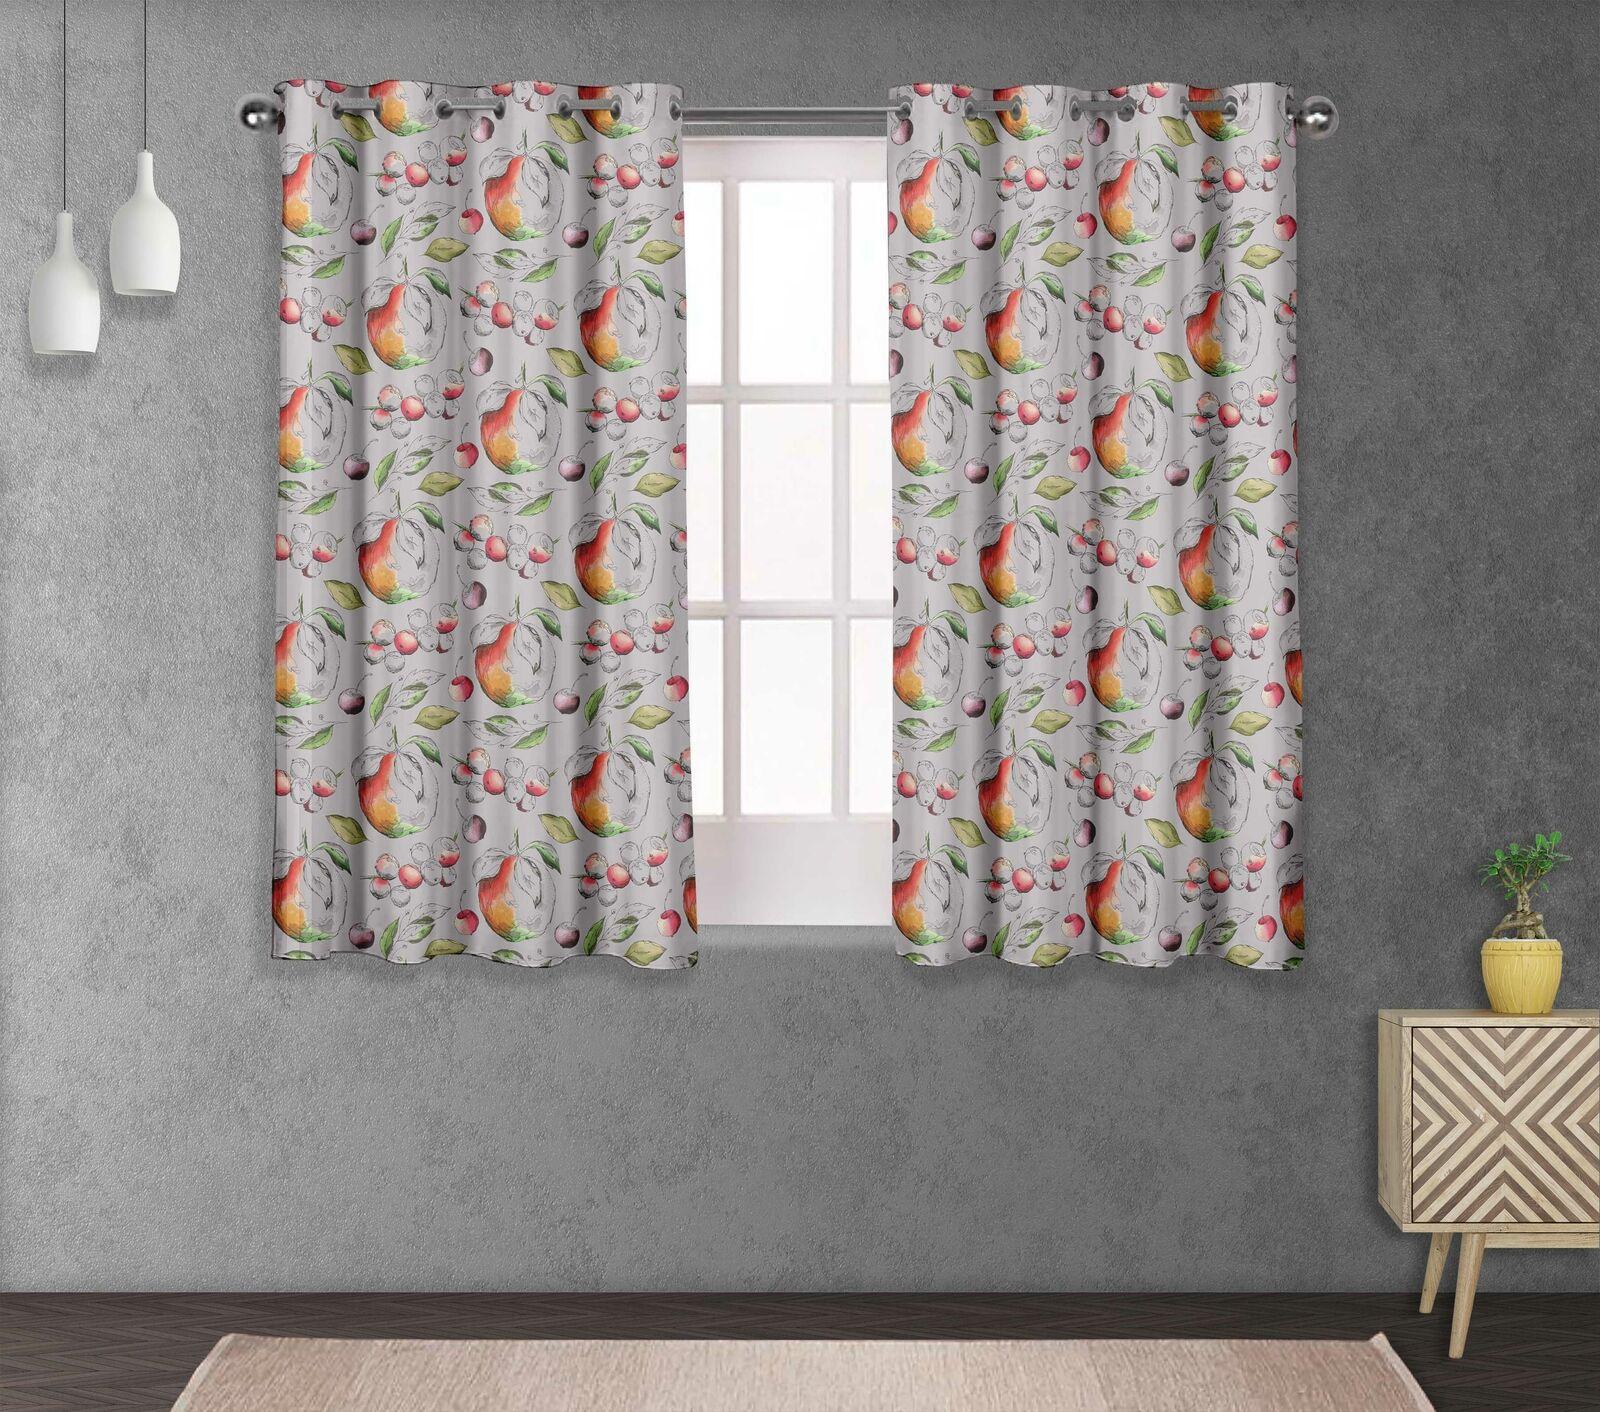 S4sassy Apple & Berries Window short & long Curtain Eyelet  Drapers-FT-553E